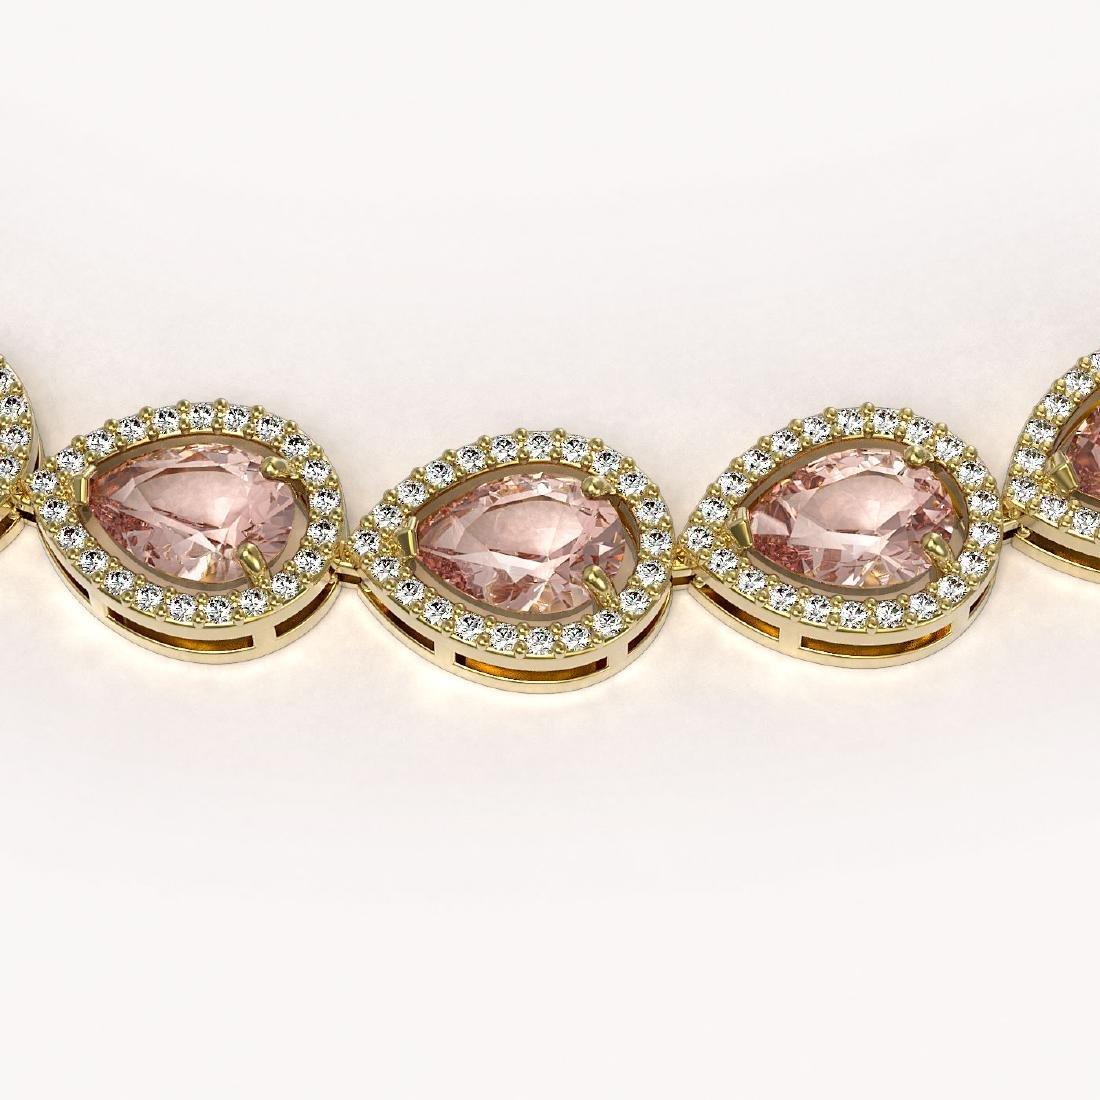 35.13 CTW Morganite & Diamond Halo Necklace 10K Yellow - 3